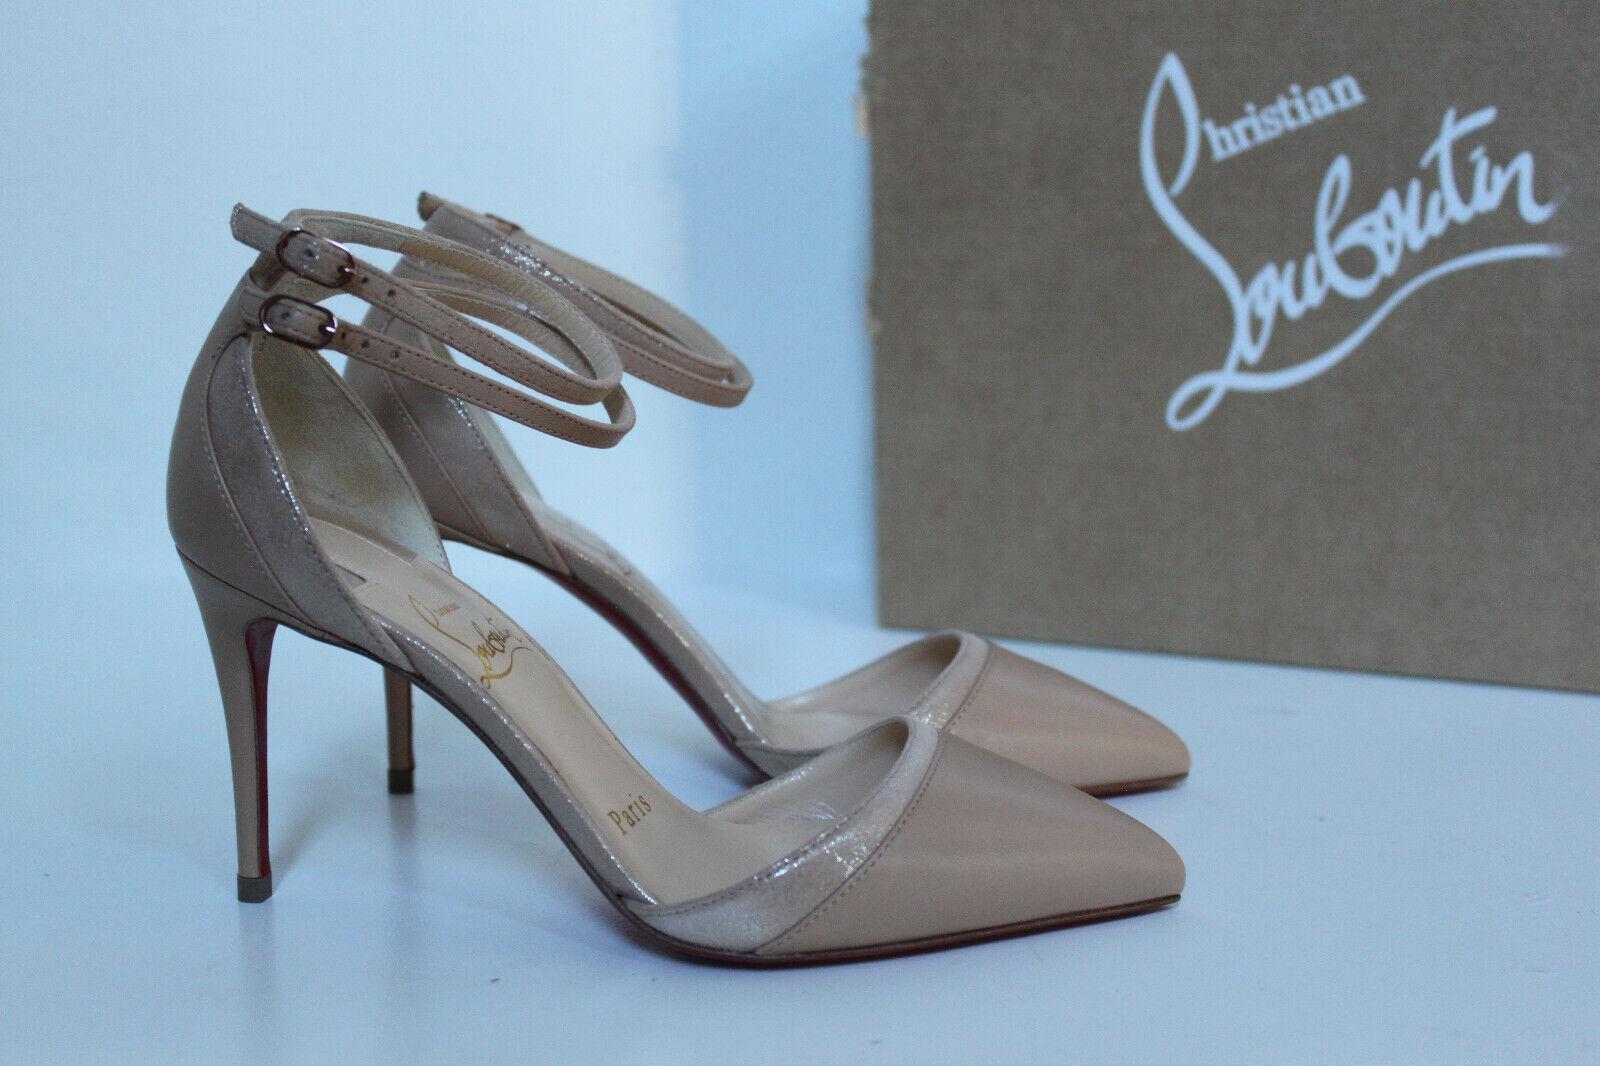 Sz 4   34 Christian Louboutin  Uptown Double Nude Leather Pointed Toe Pump scarpe  i nuovi stili più caldi